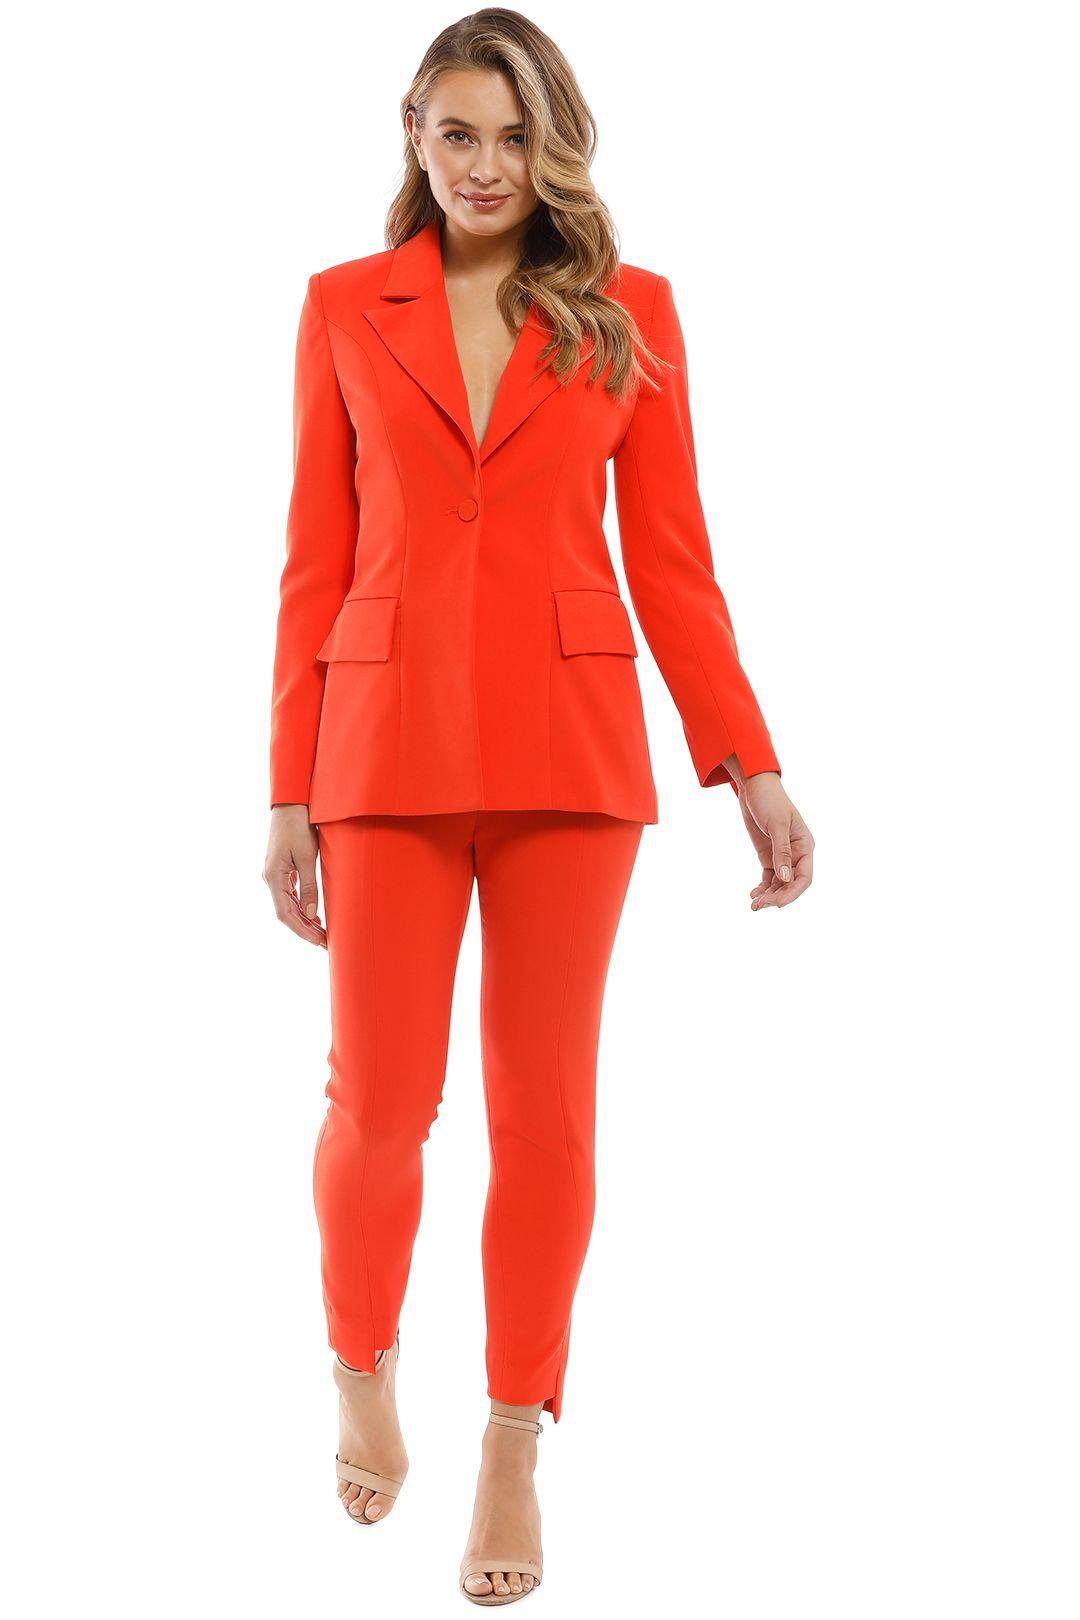 Elliatt - Harper Blazer and Pant Set - Tangerine - Front